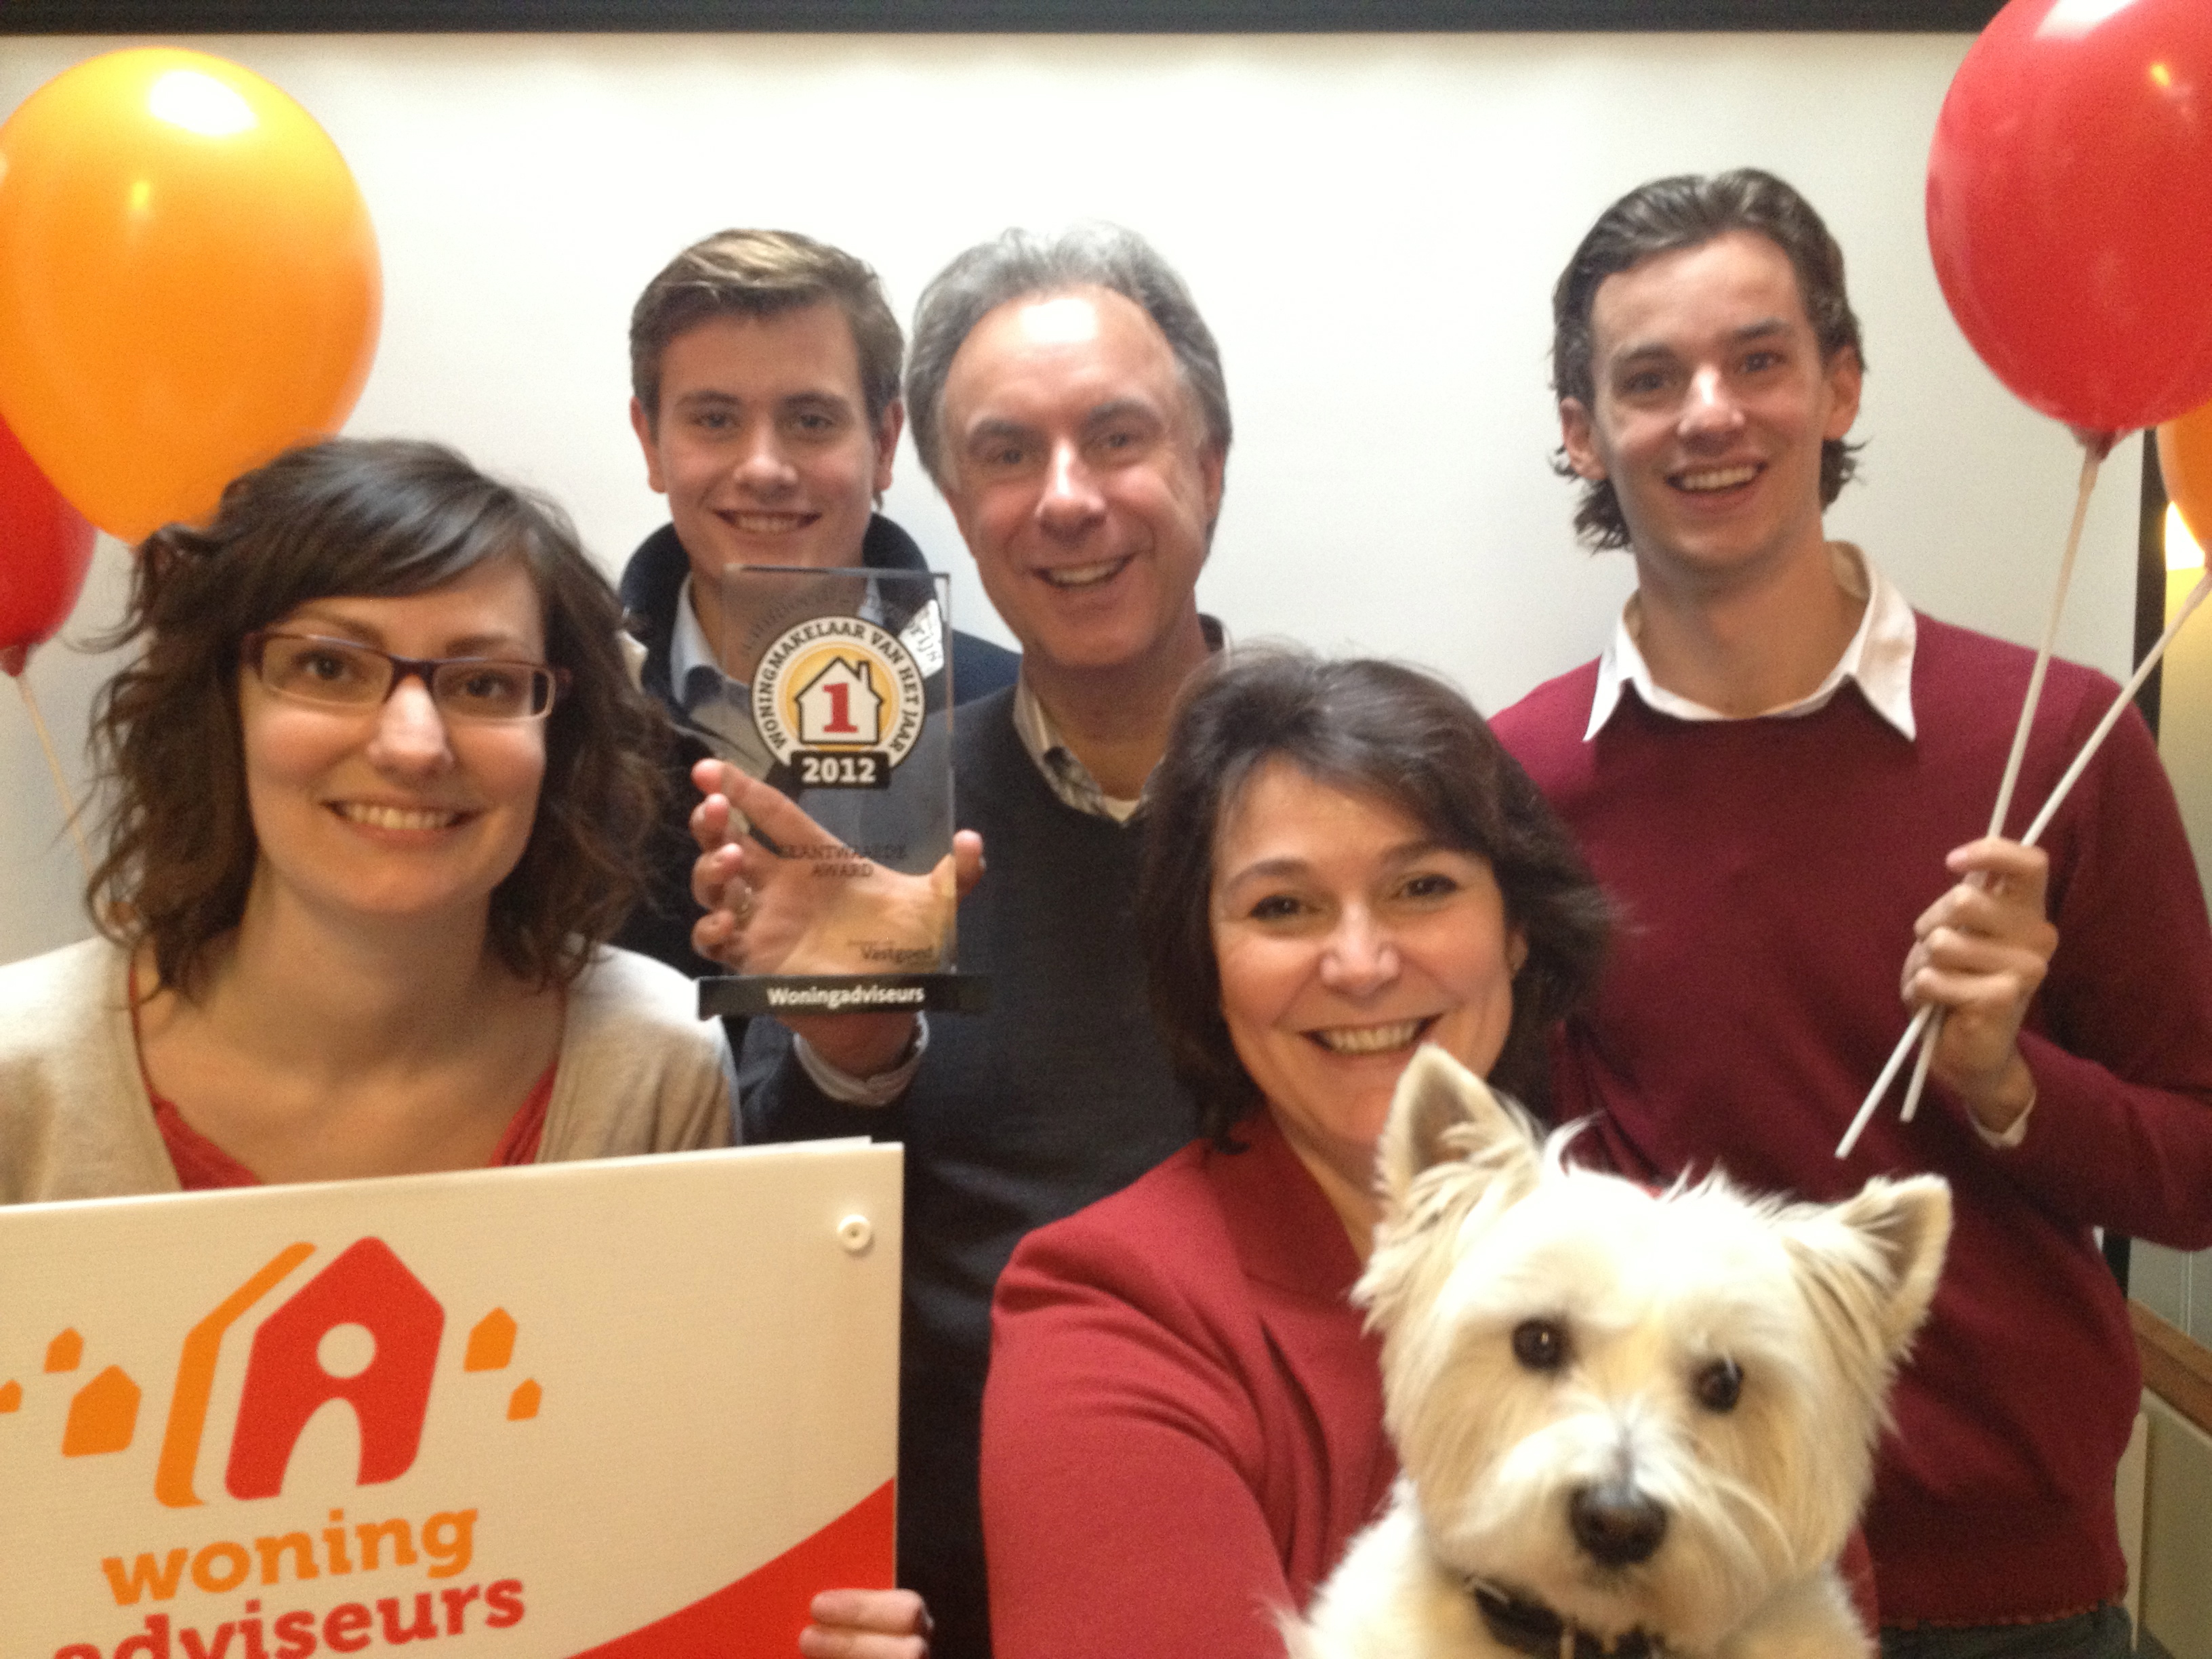 Woningmakelaar van het jaar: Team Woningadviseurs wint Klantwaarde Award